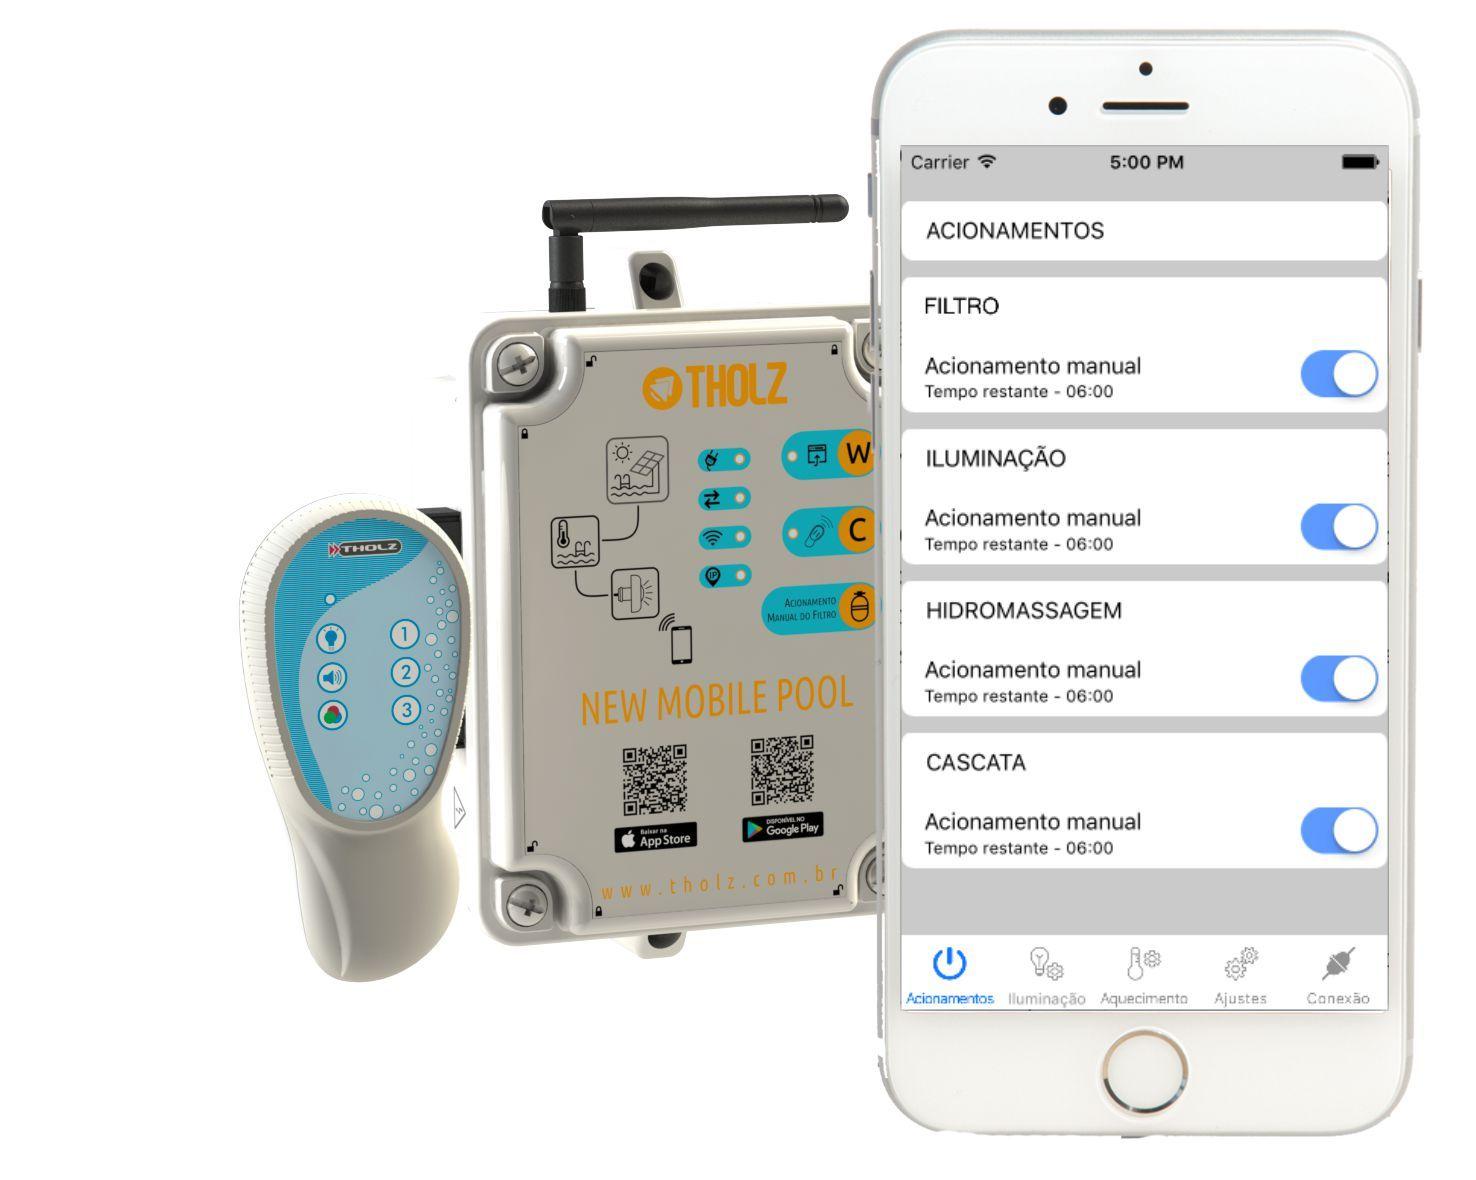 New Mobile Pool - Mcx1169n - Automação Para Piscina Wifi